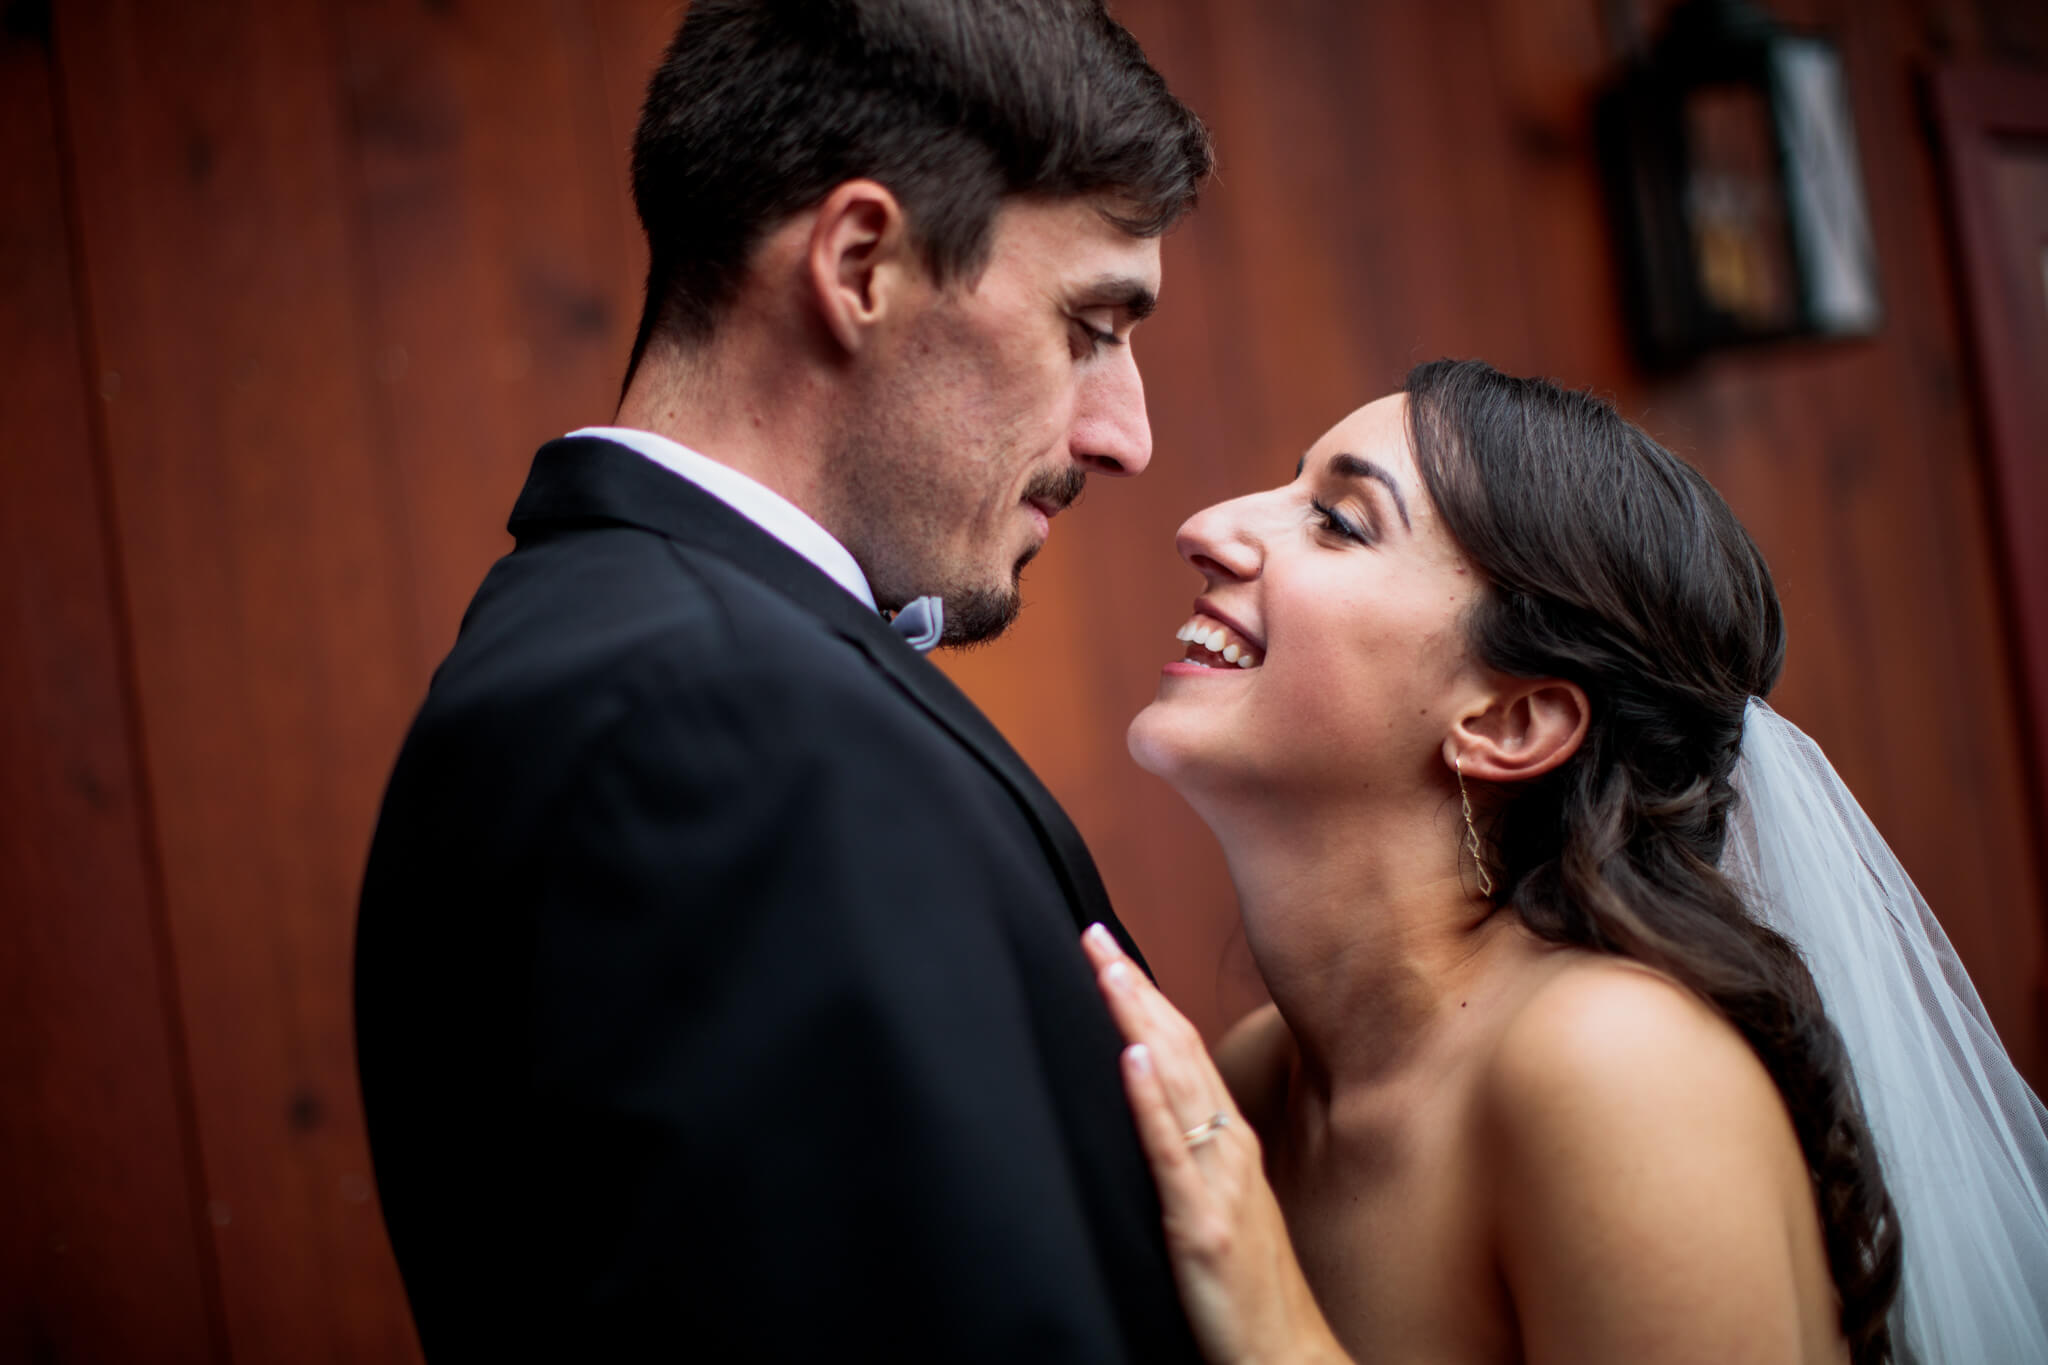 Alysia Jerad Homestead Blessings Farm Hershey PA Wedding Rustic Chique - 78.JPG